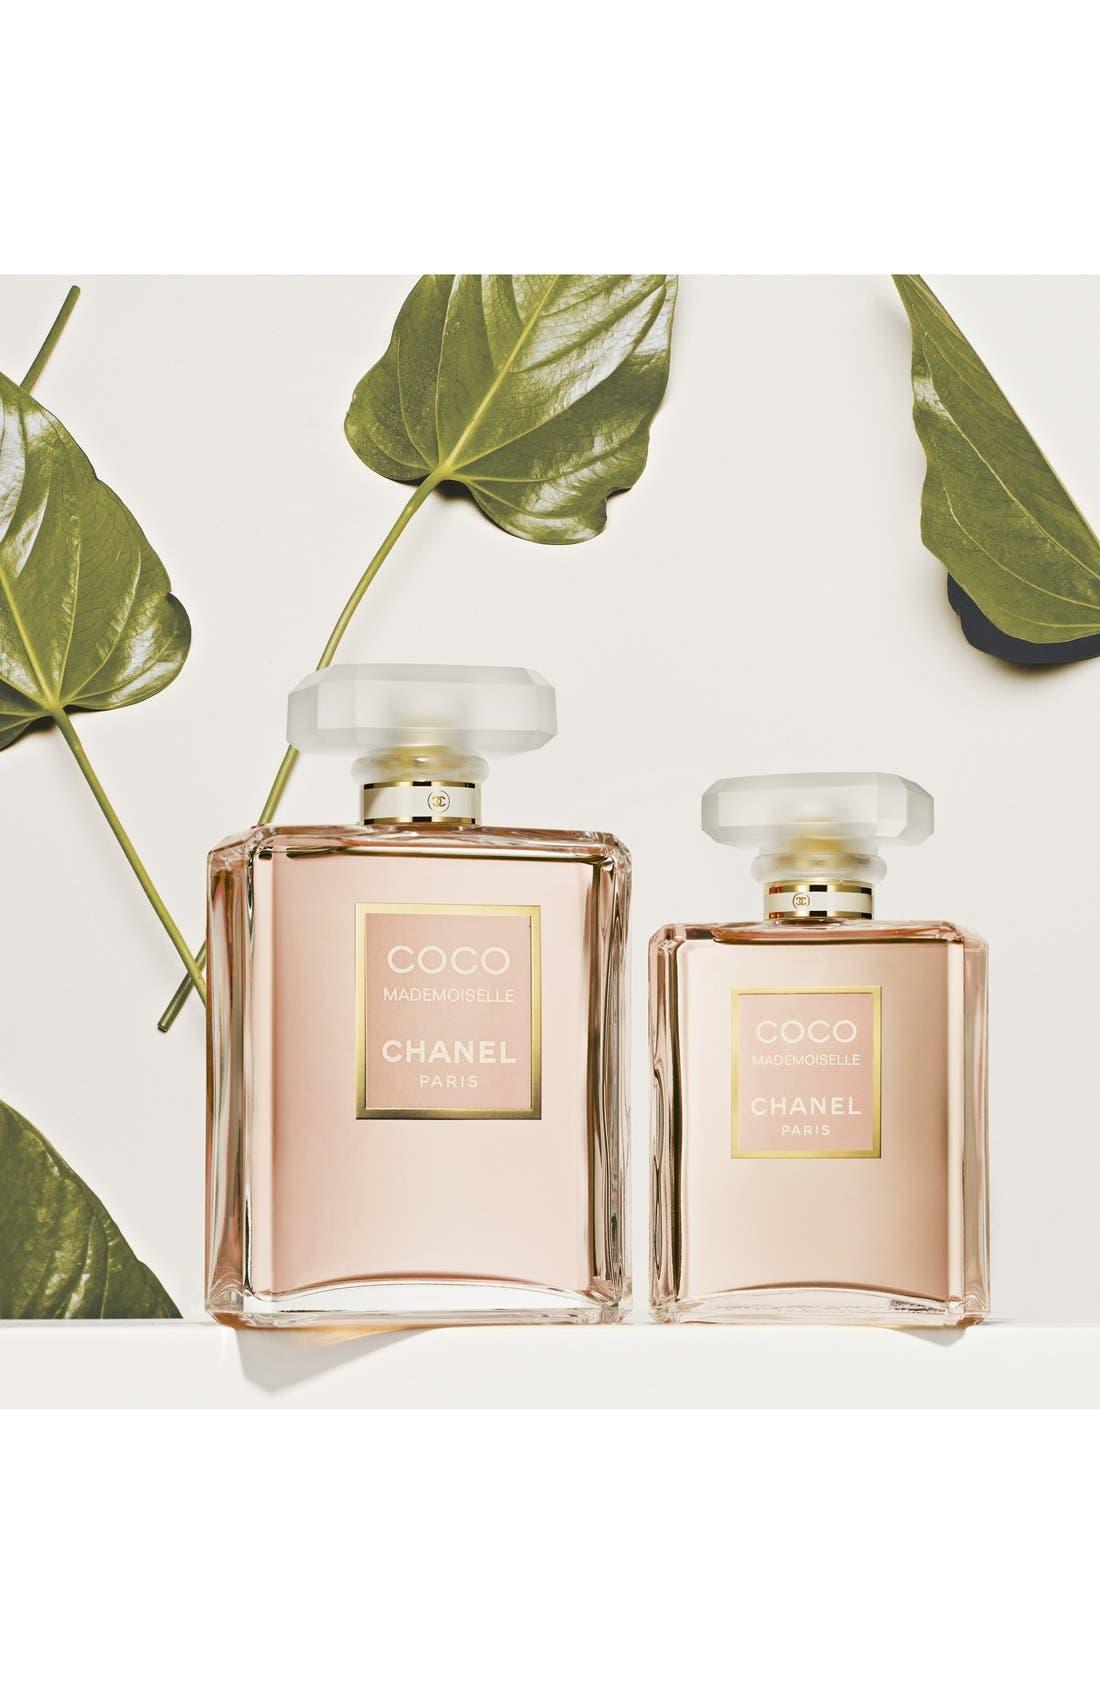 CHANEL, COCO MADEMOISELLE<br />Eau De Parfum Spray, Alternate thumbnail 2, color, NO COLOR